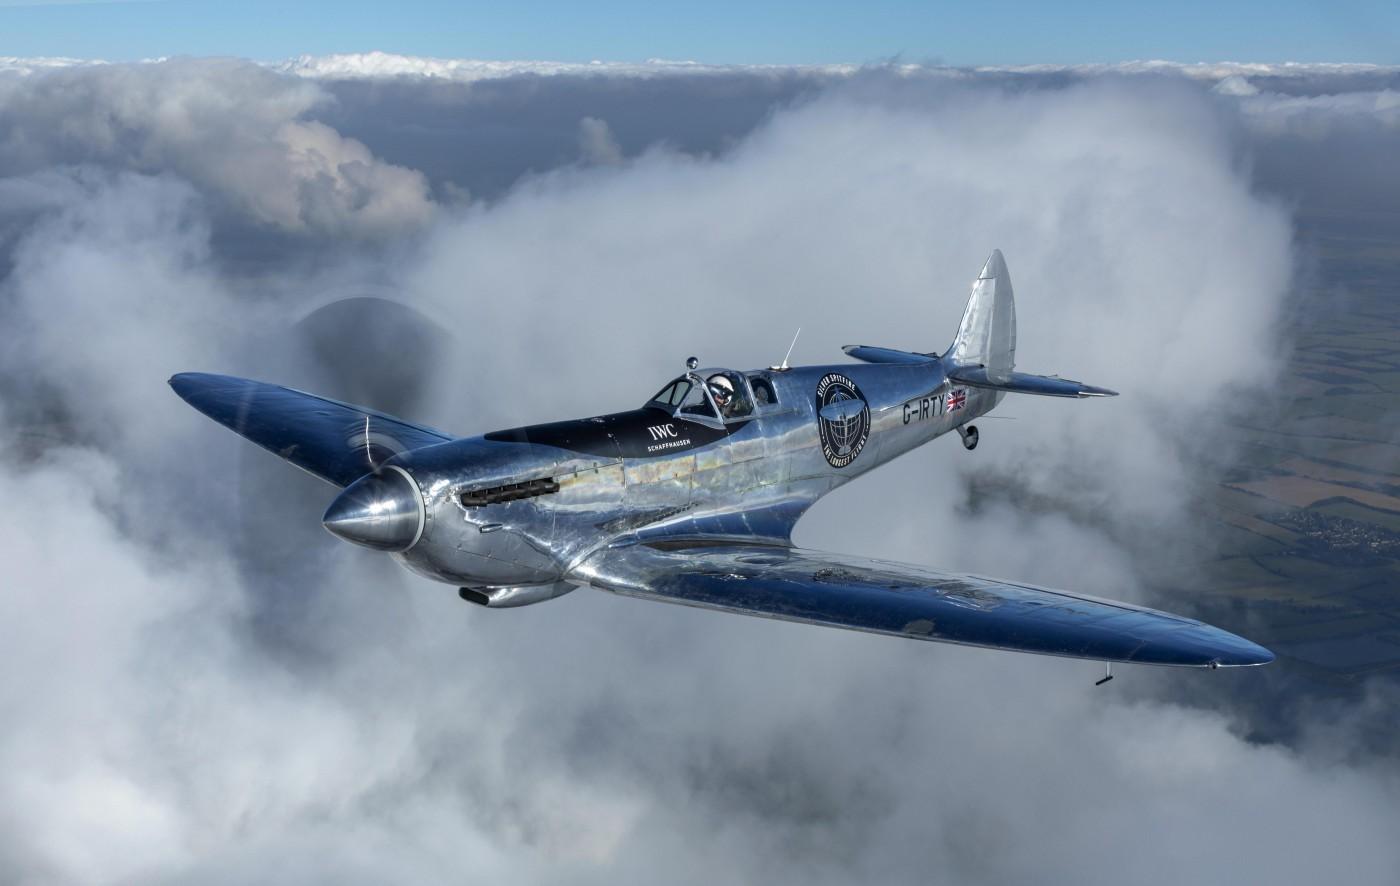 Реставрираха легендарния самолет Silver Spitfire